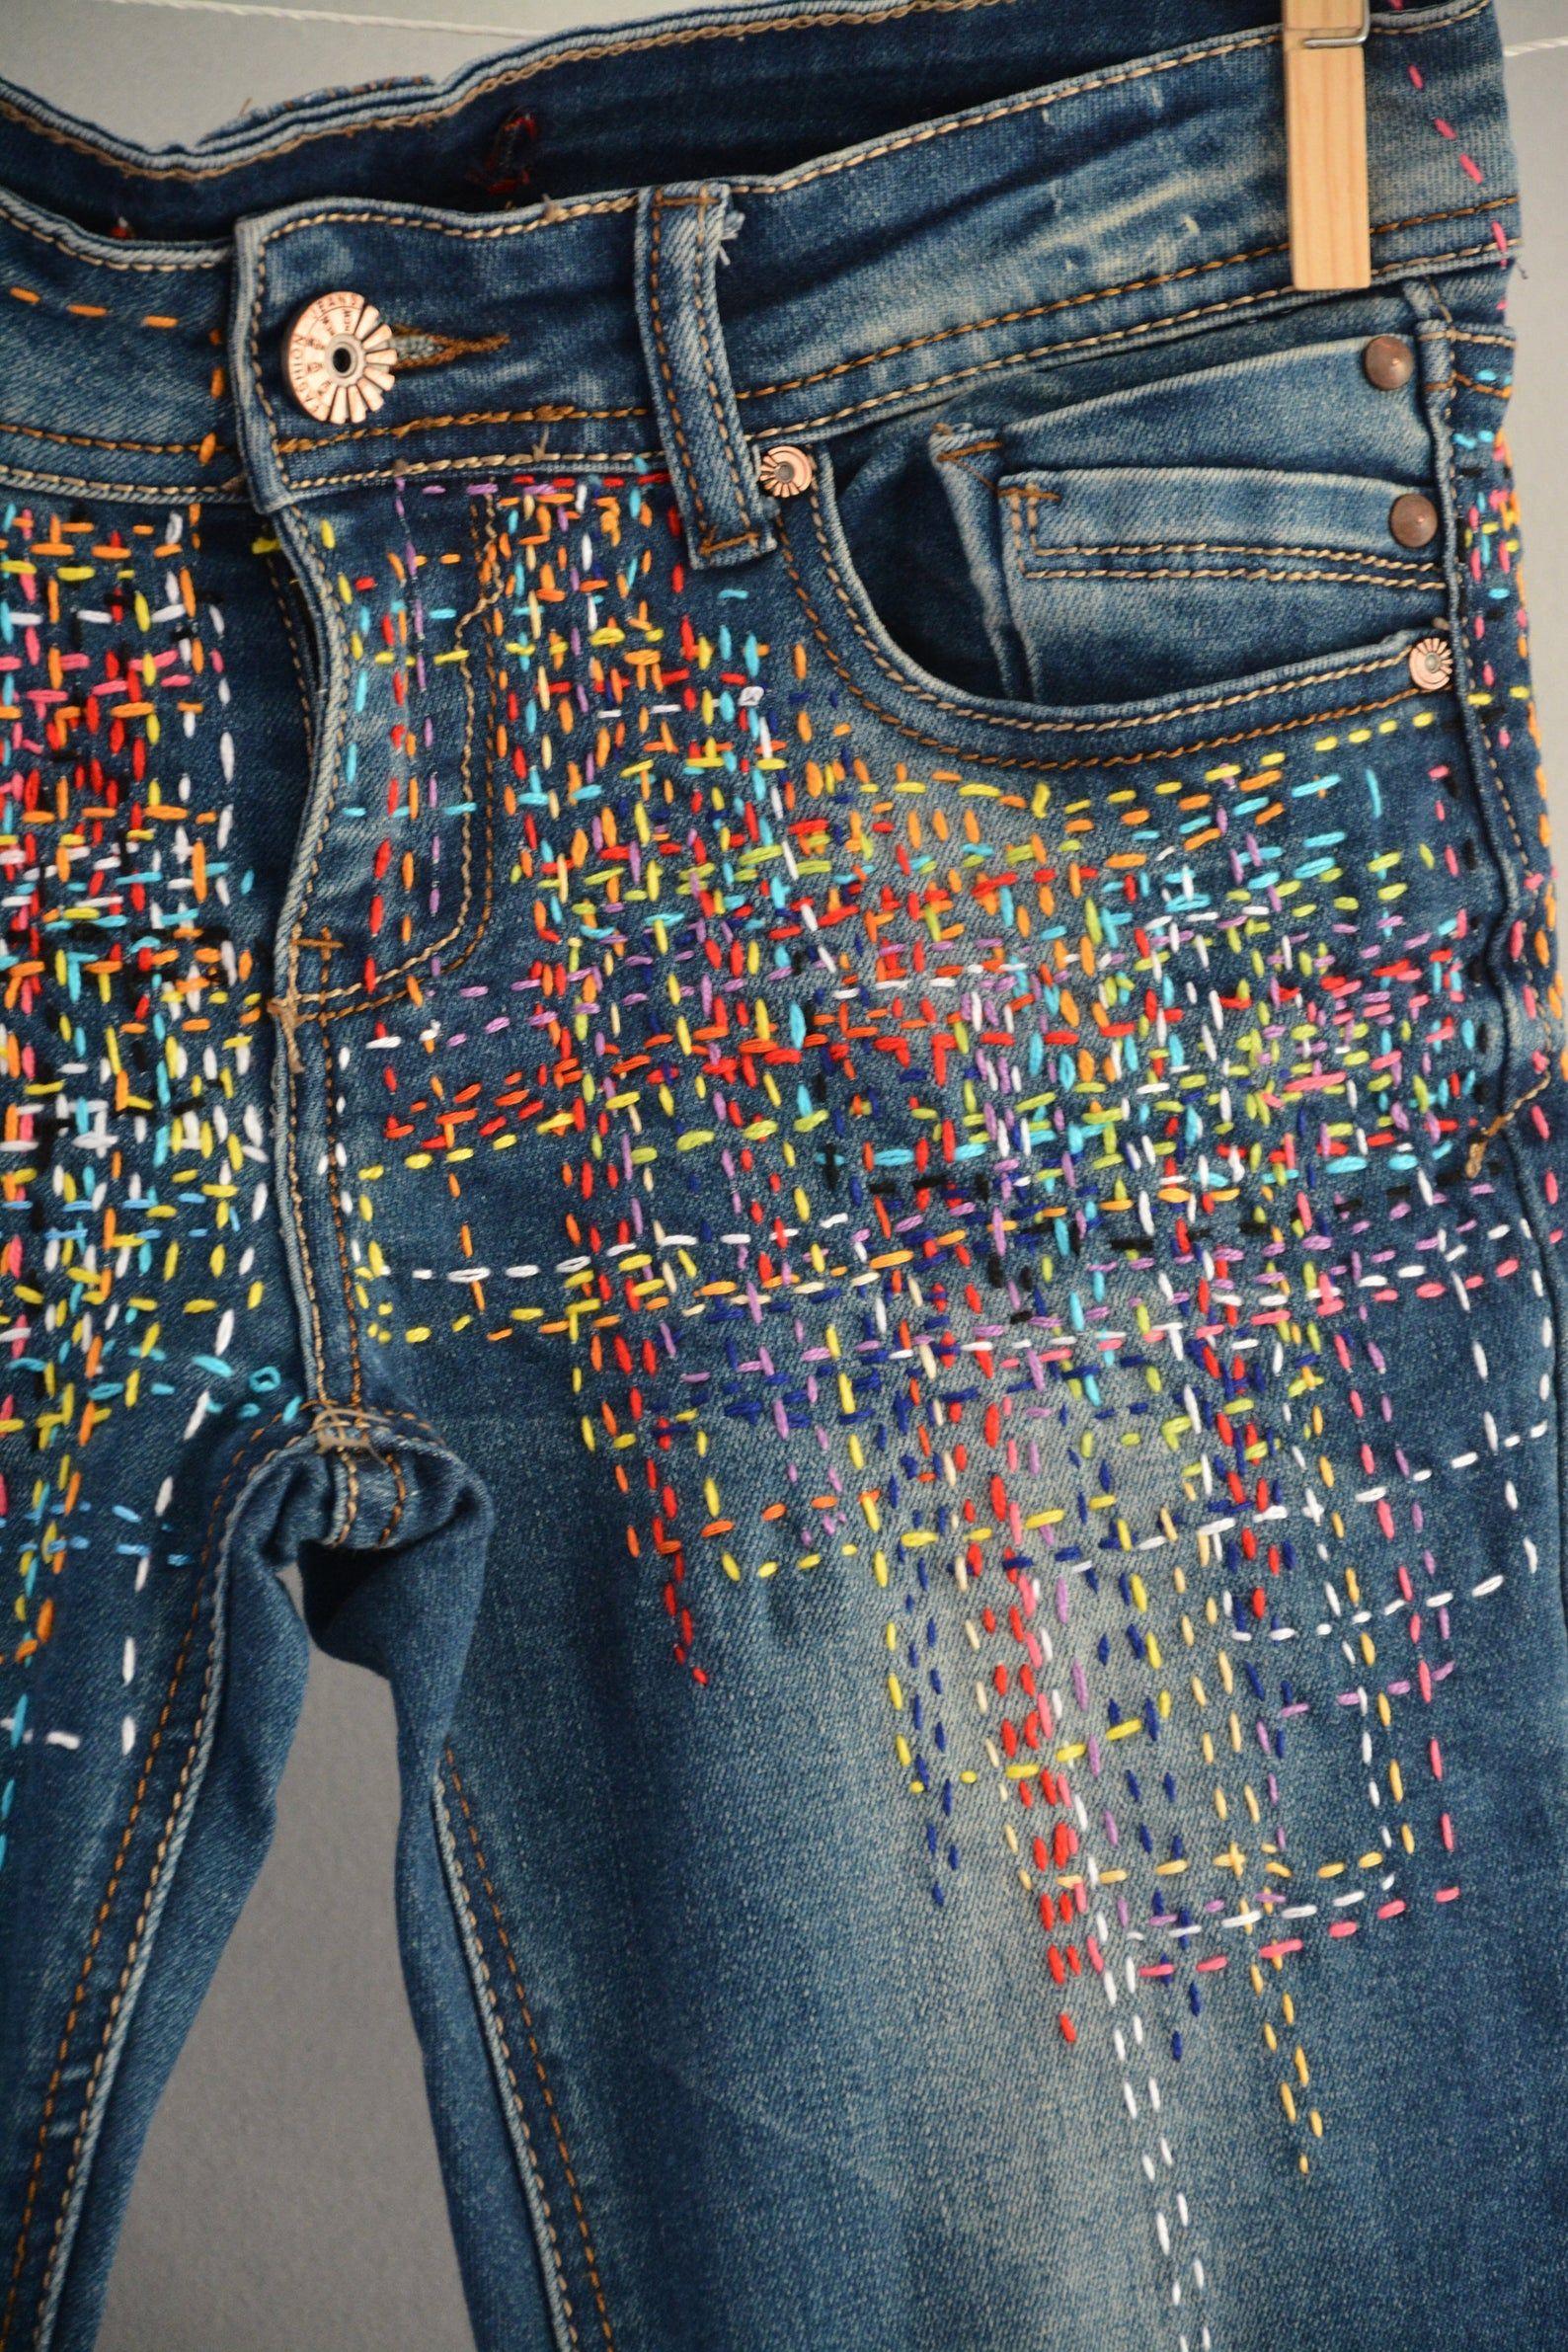 High waist destroyed boyfriend jeans distressed and